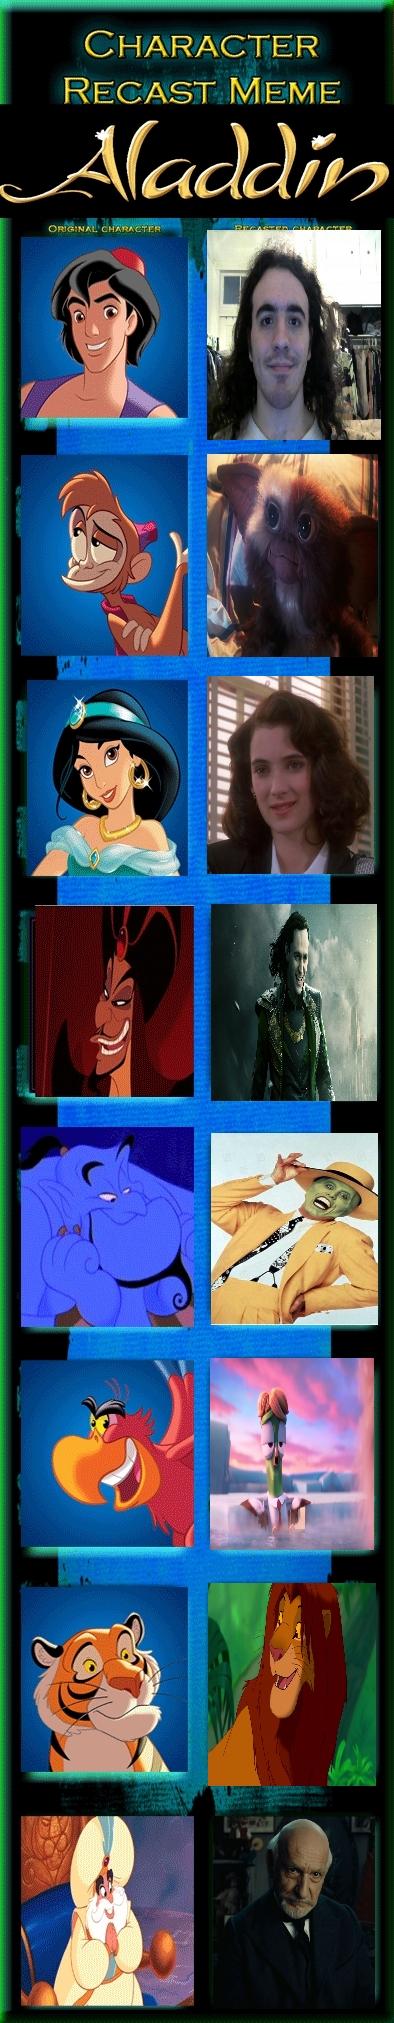 My Aladdin Recast Meme by Carriejokerbates